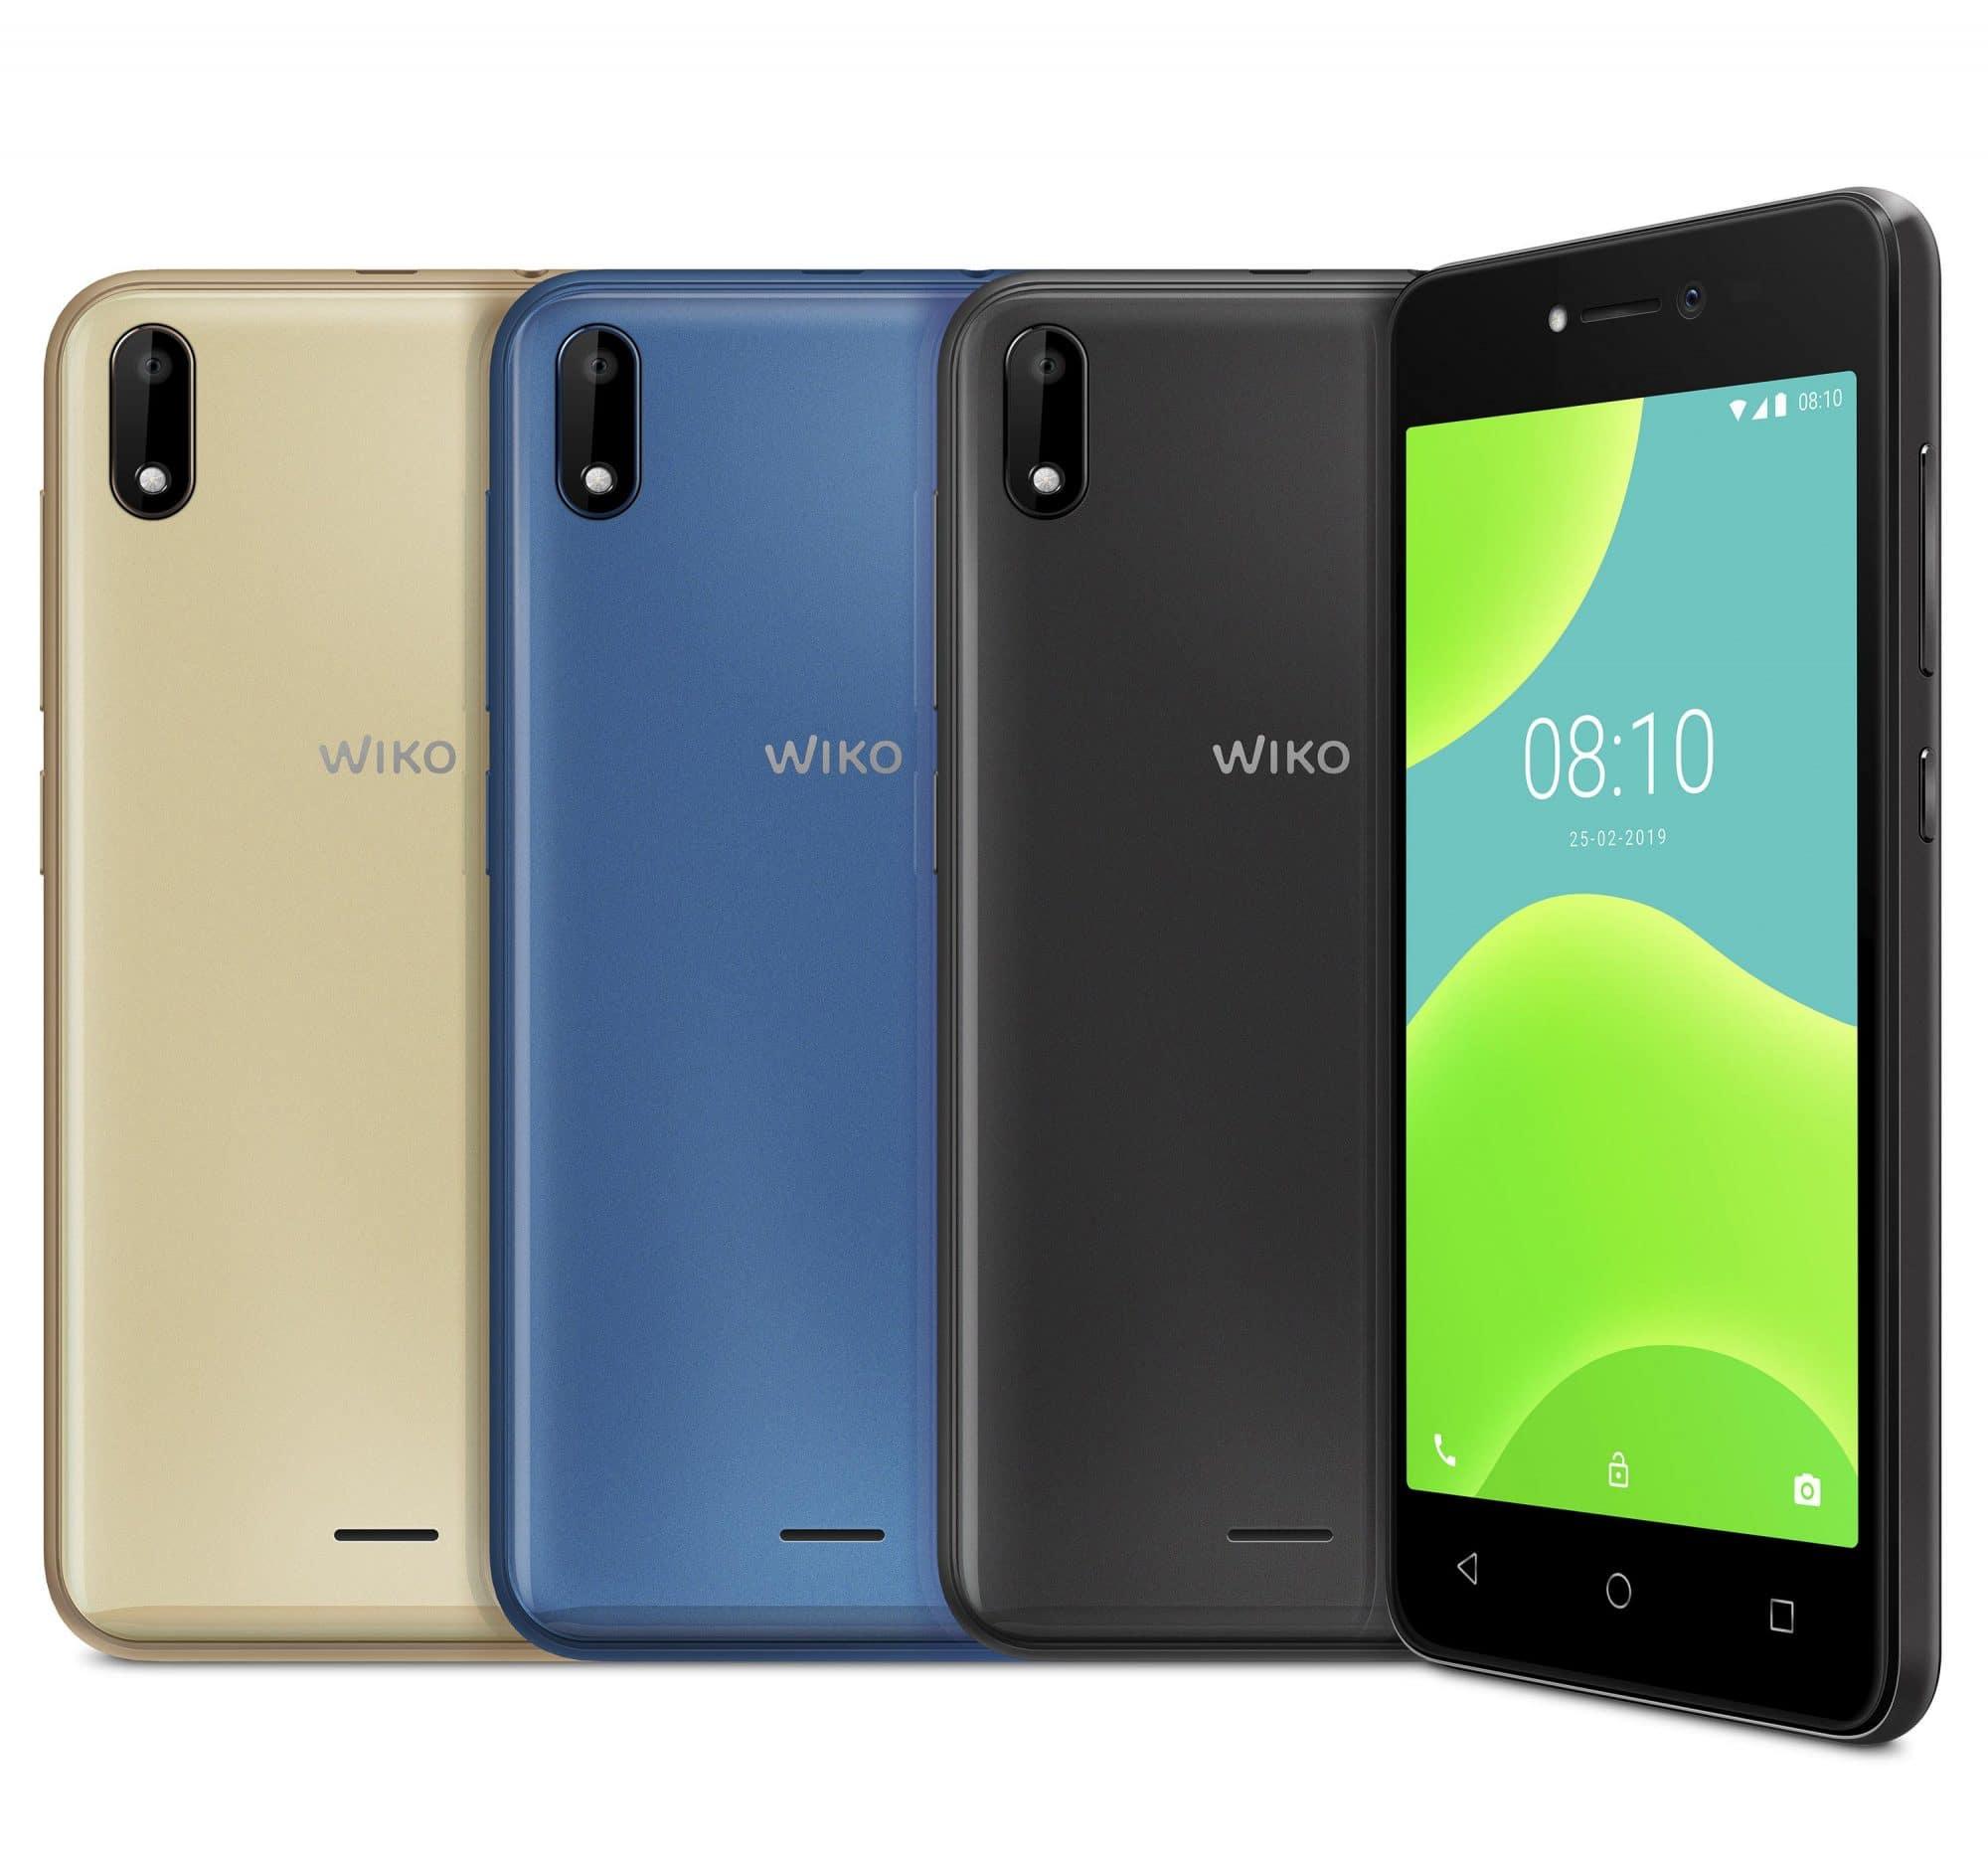 wiko sunny4 สมาร์ทโฟน ครบทุกฟังก์ชั่น ในราคาเพียง 1,790 - Wiko Sunny4 สมาร์ทโฟน ครบทุกฟังก์ชั่น ในราคาเพียง 1,790